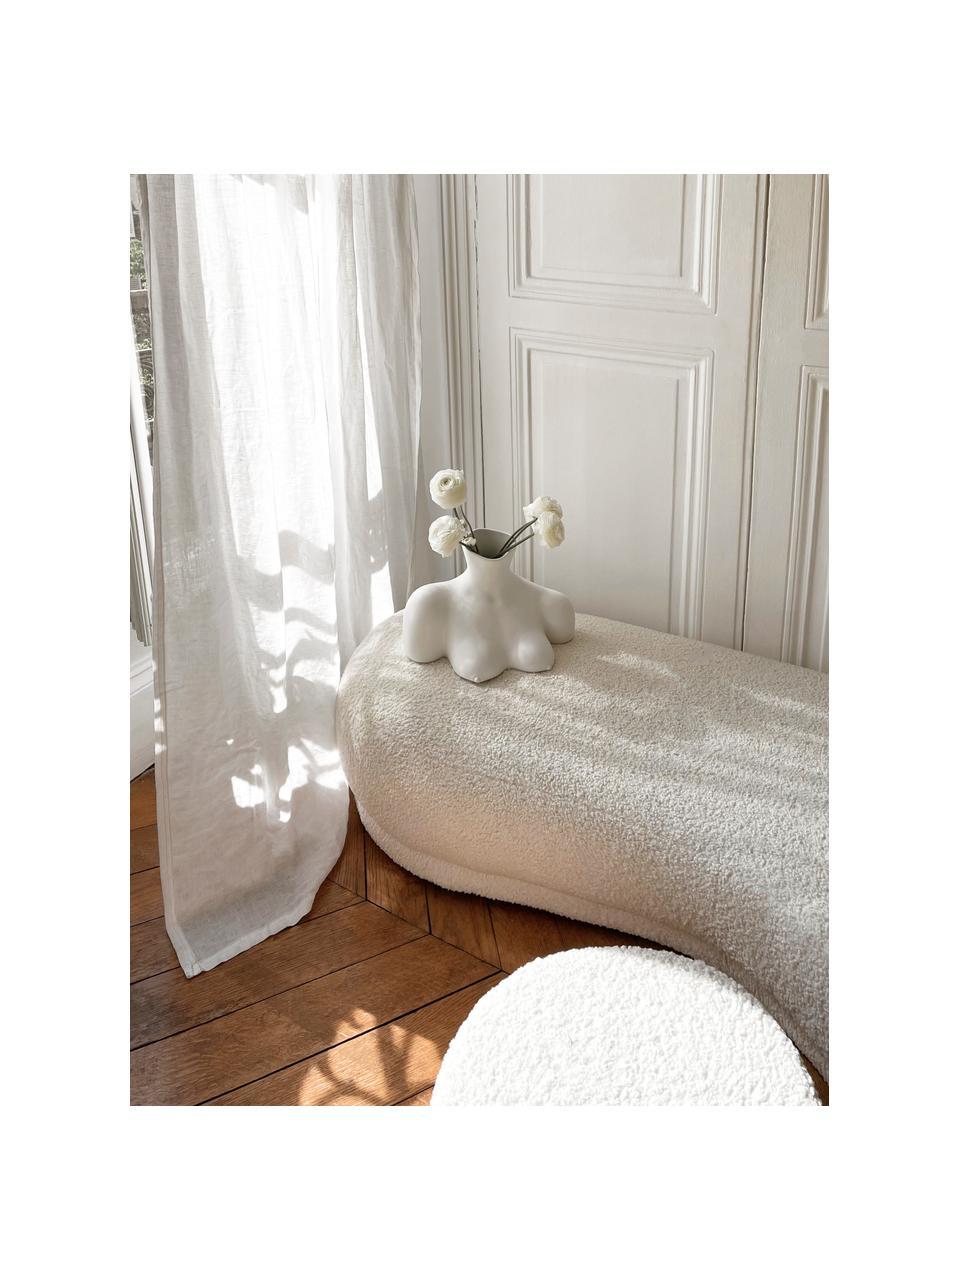 Teddy-Sitzbank Coconino in Cremeweiß, gepolstert, Bezug: Polyester (Teddy), Gestell: Kiefernholz, Teddy Cremeweiß, 160 x 36 cm